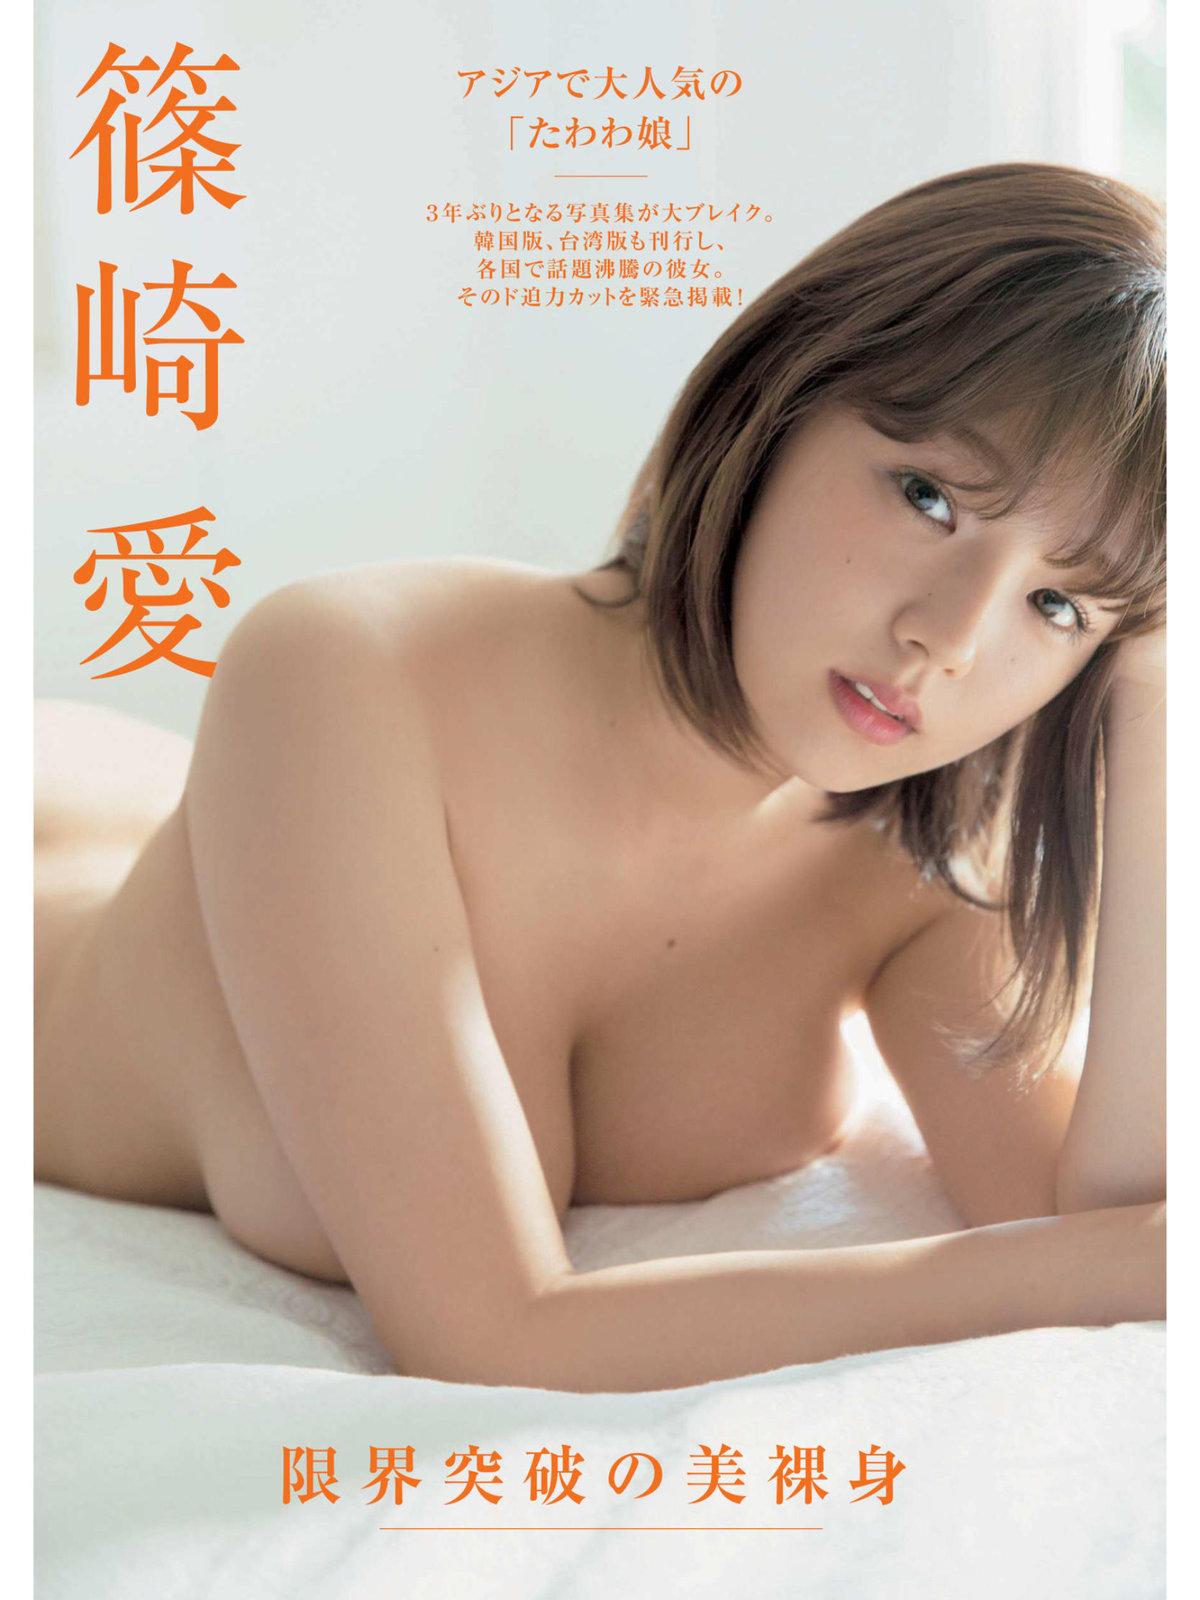 Ai Shinozaki 篠崎愛, Shukan Gendai 2017.11.18 (週刊現代 2017年11月18日号)